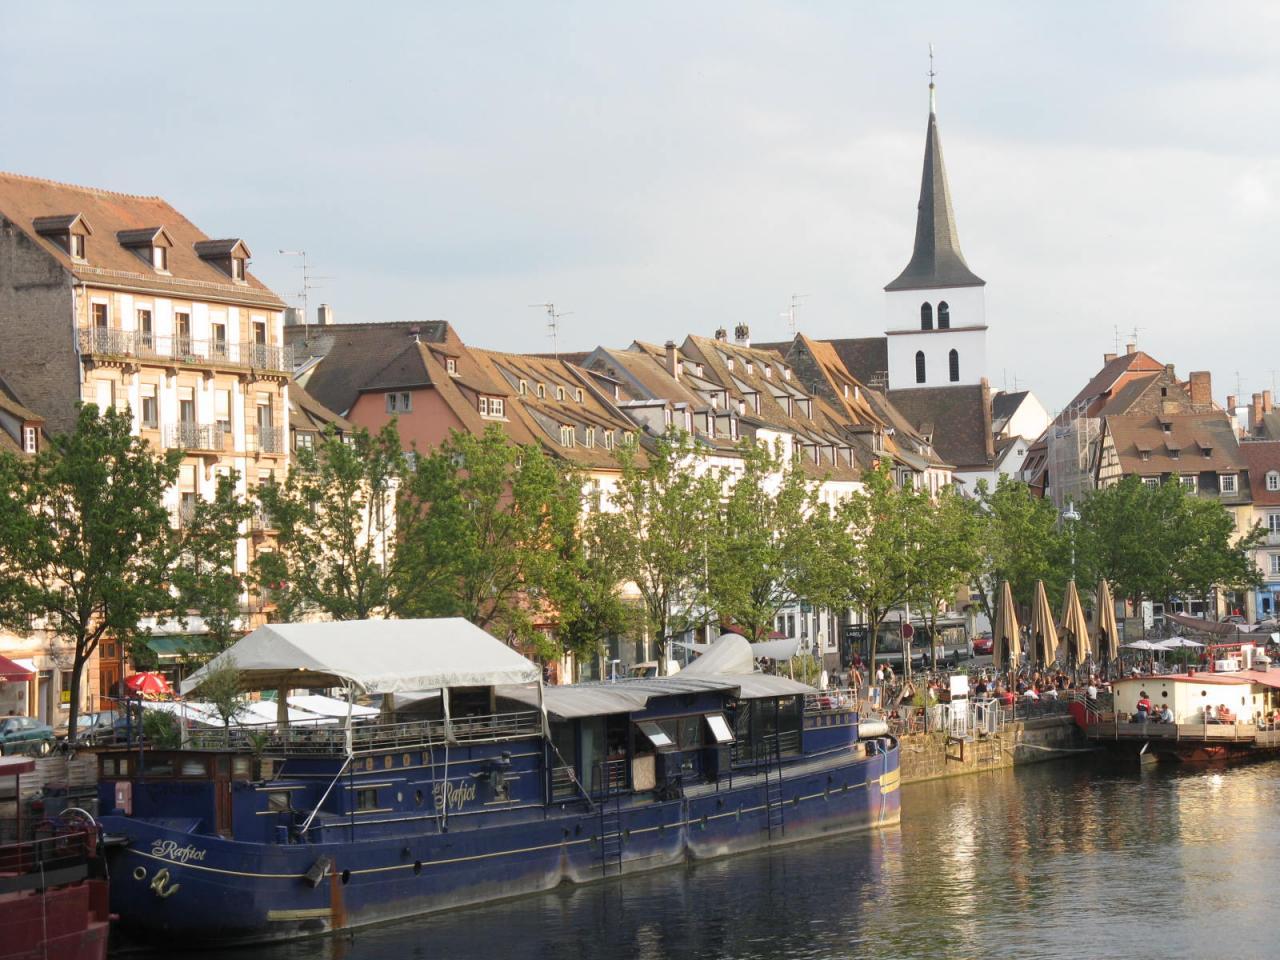 Congr+¿s +á Strasbourg du 16 au 20-06-14 119